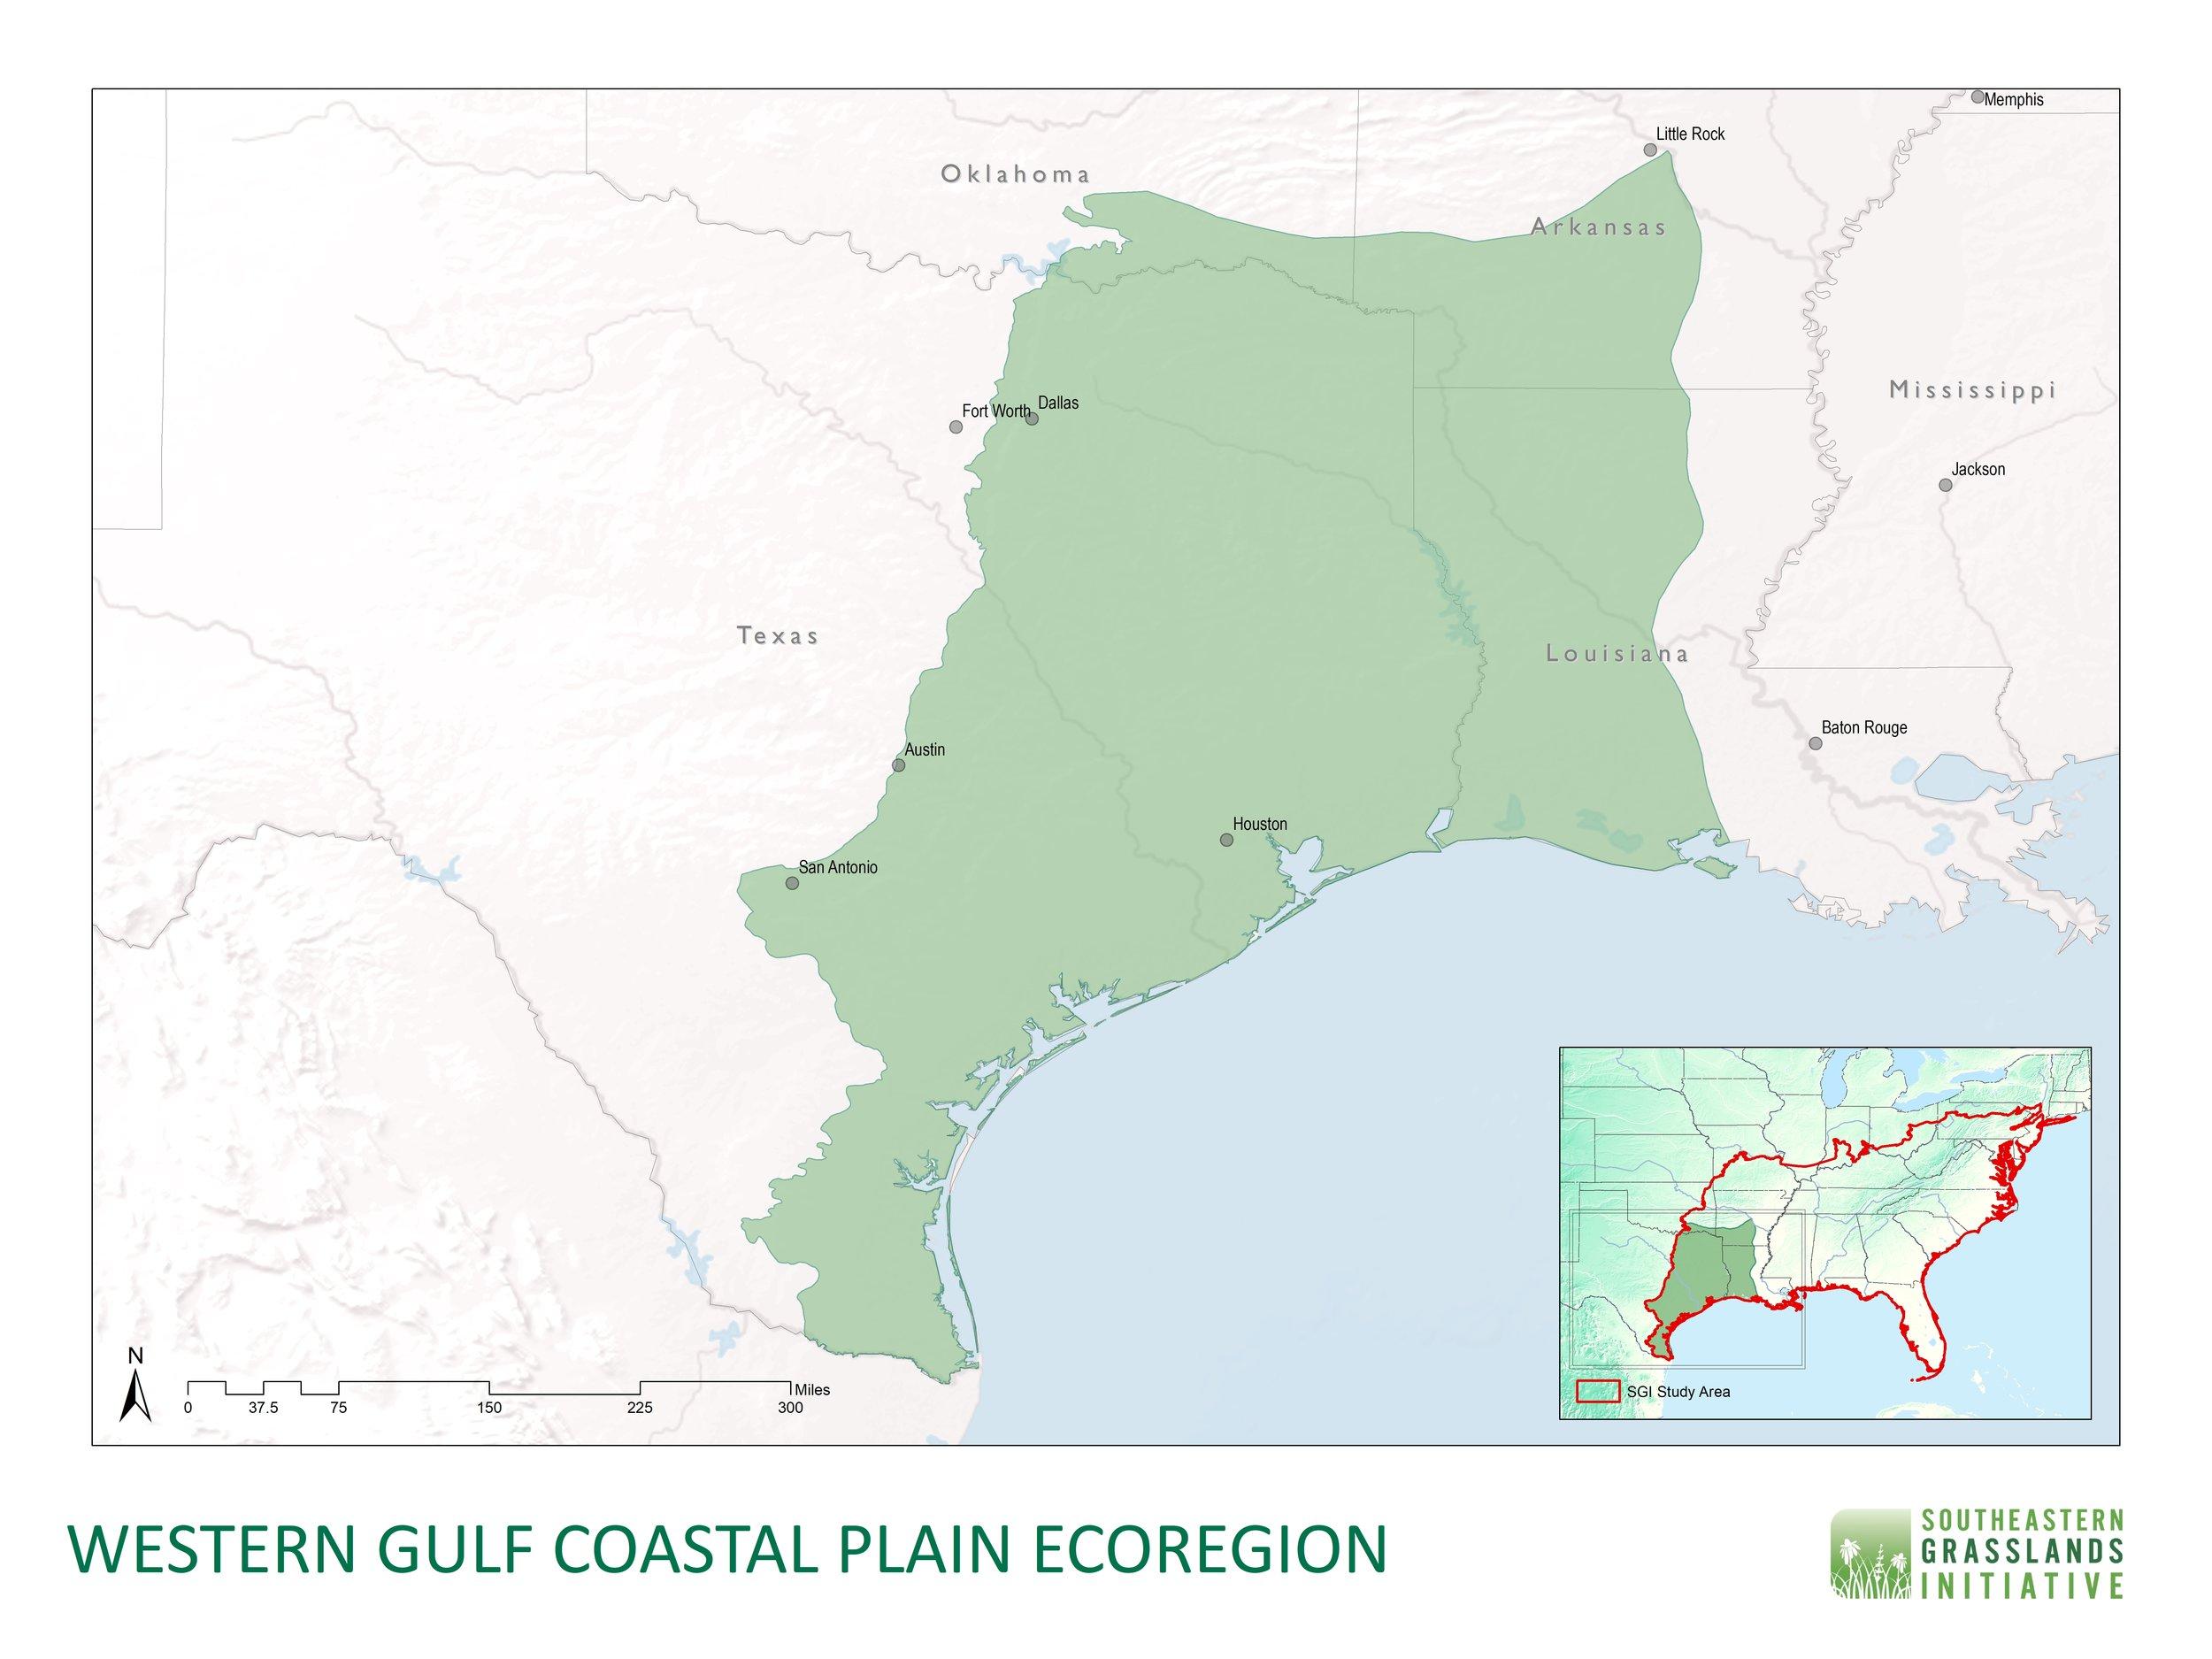 West Gulf Coastal Plain